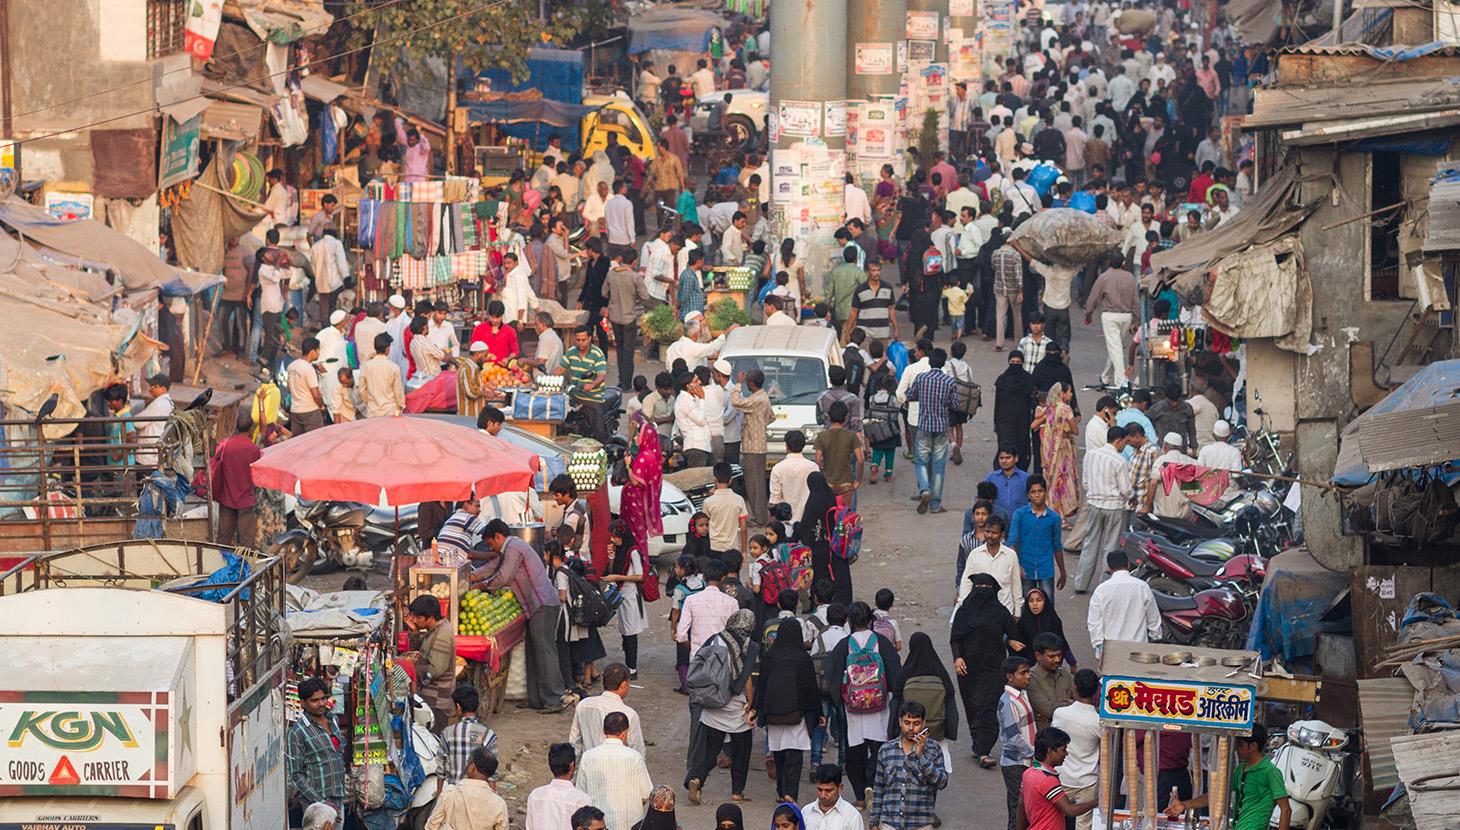 In contrast, the streets of Dharavi, Mumbai ph. Adam Cohen